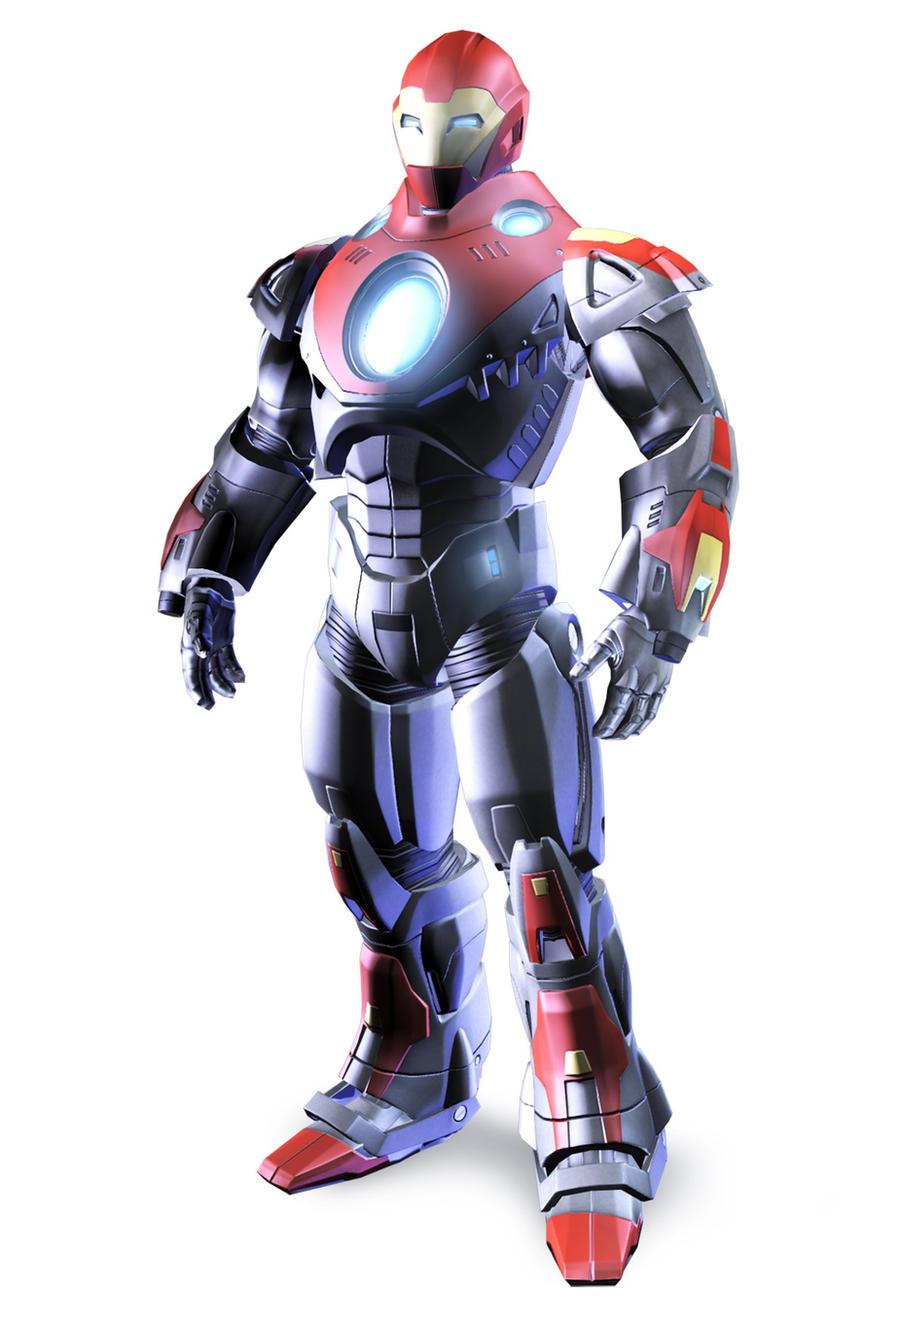 Ultimate Iron Man Armor by BluePhoenix012 on DeviantArt